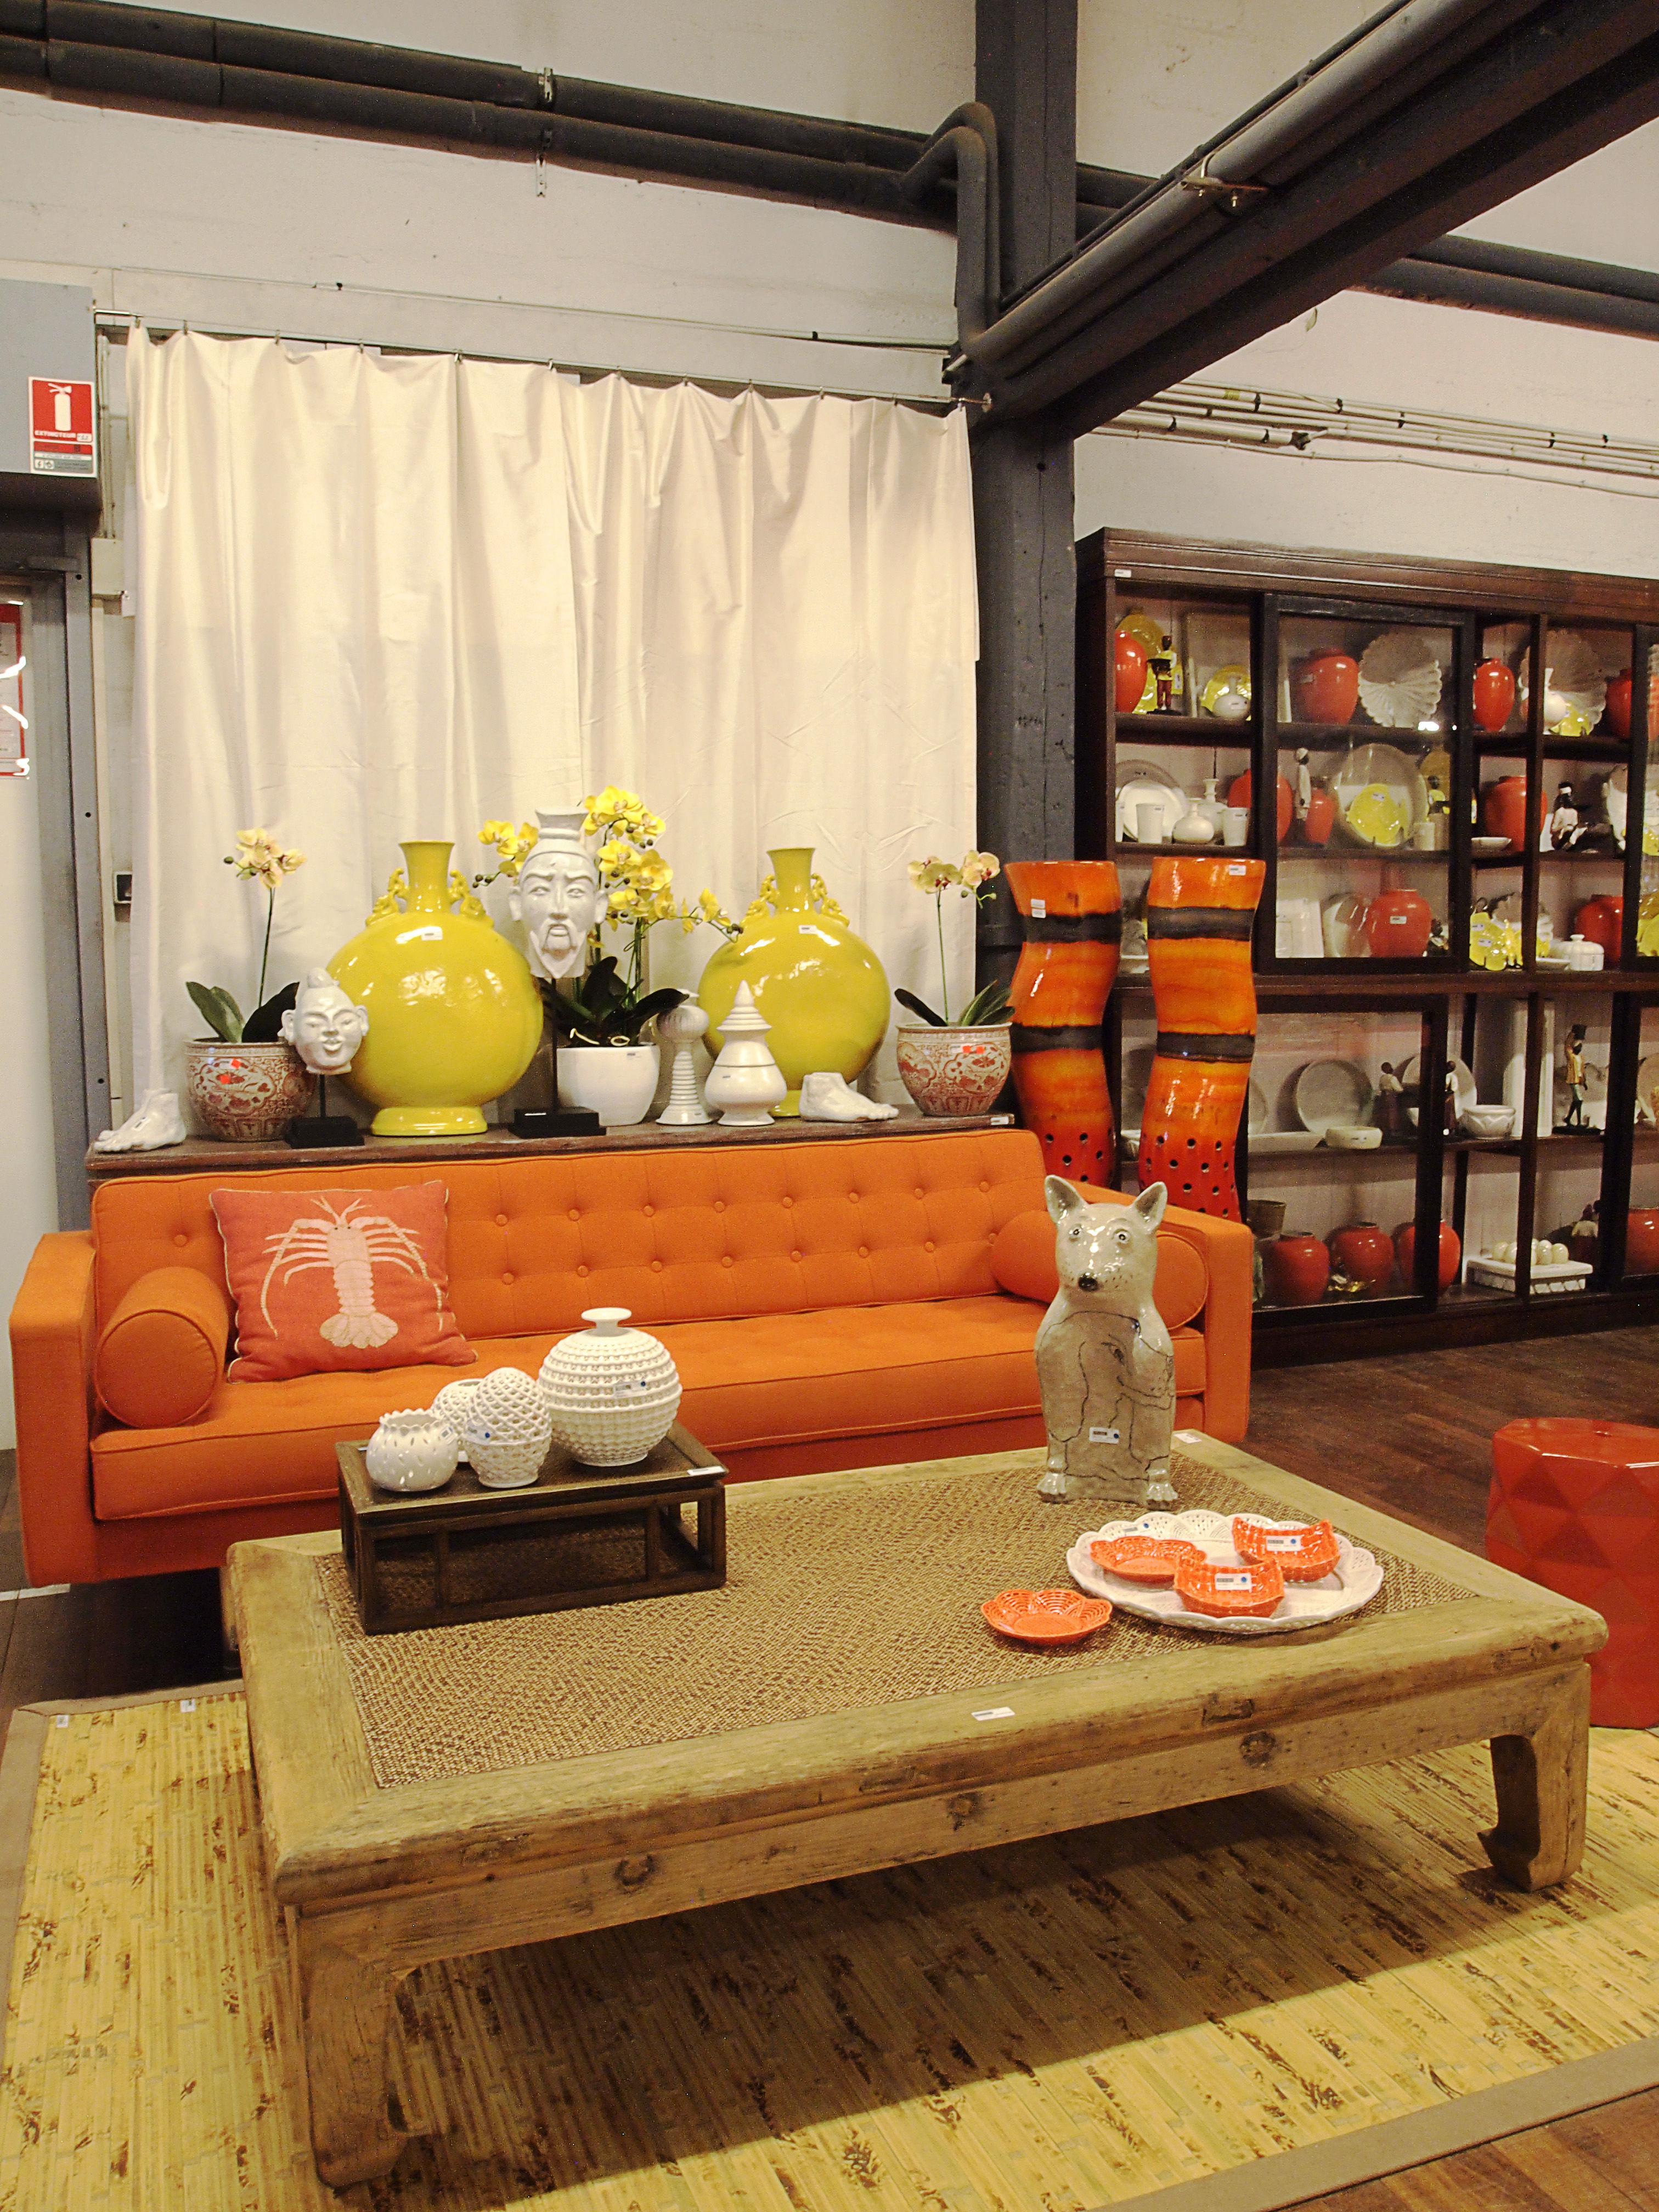 canap droit 3 places l 215 cm orange made in design editions. Black Bedroom Furniture Sets. Home Design Ideas